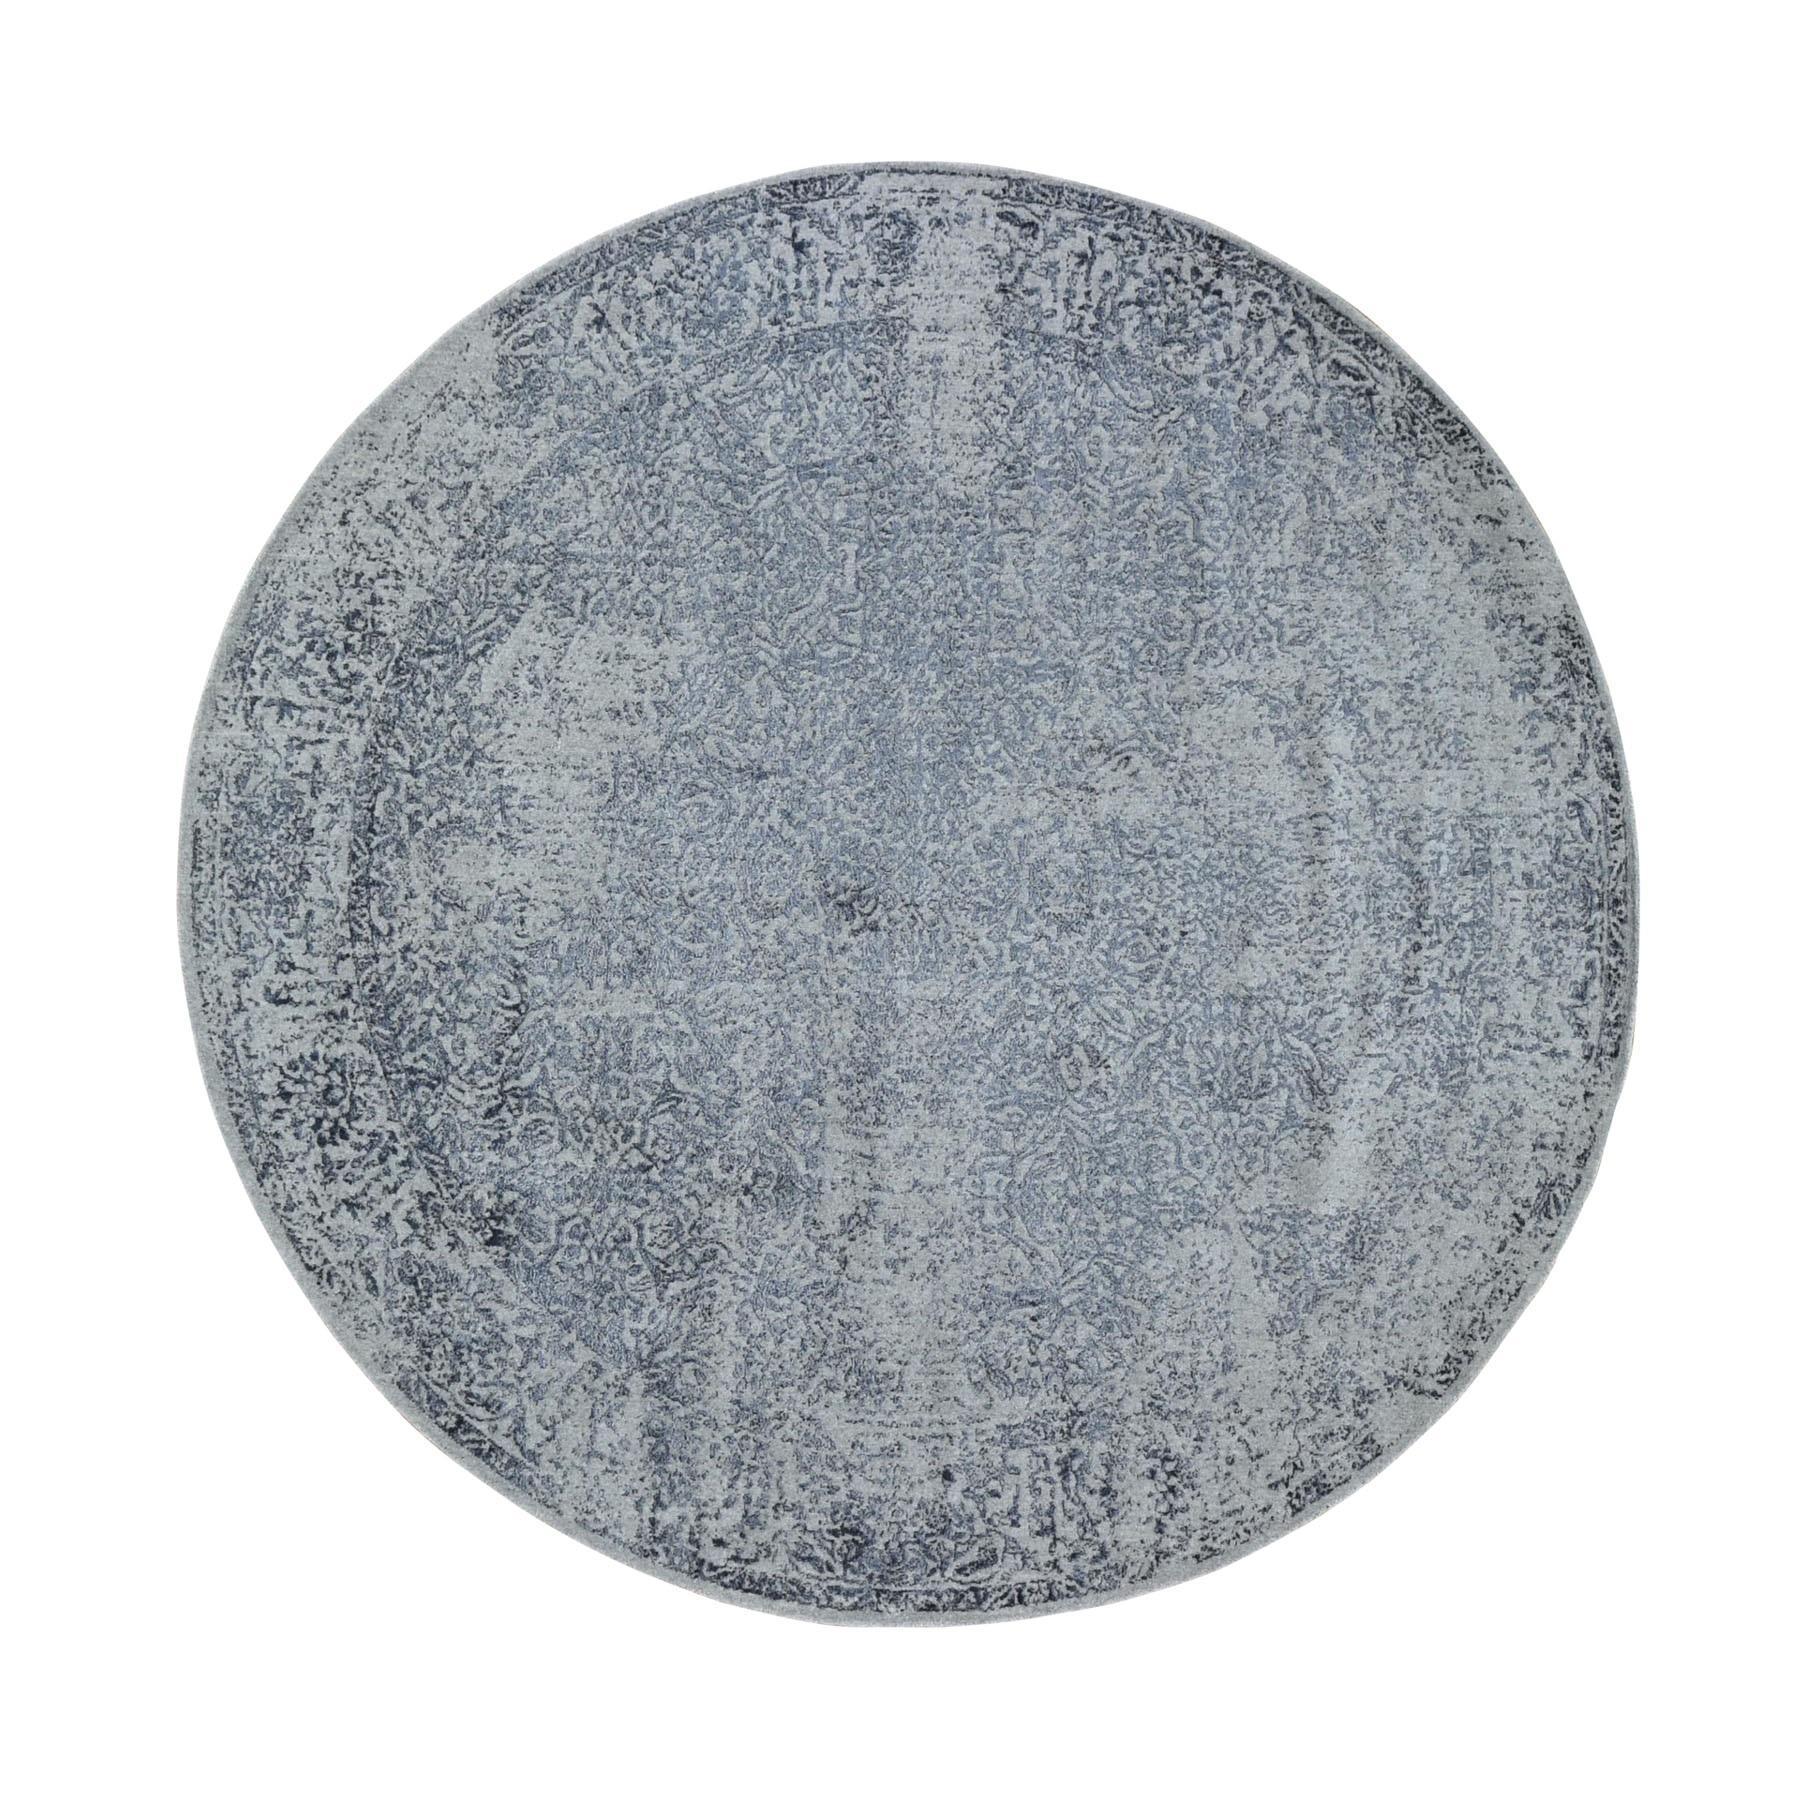 "7'10""x7'10"" Round Fine jacquard Hand Loomed Erased Design Wool And Silk Oriental Rug"